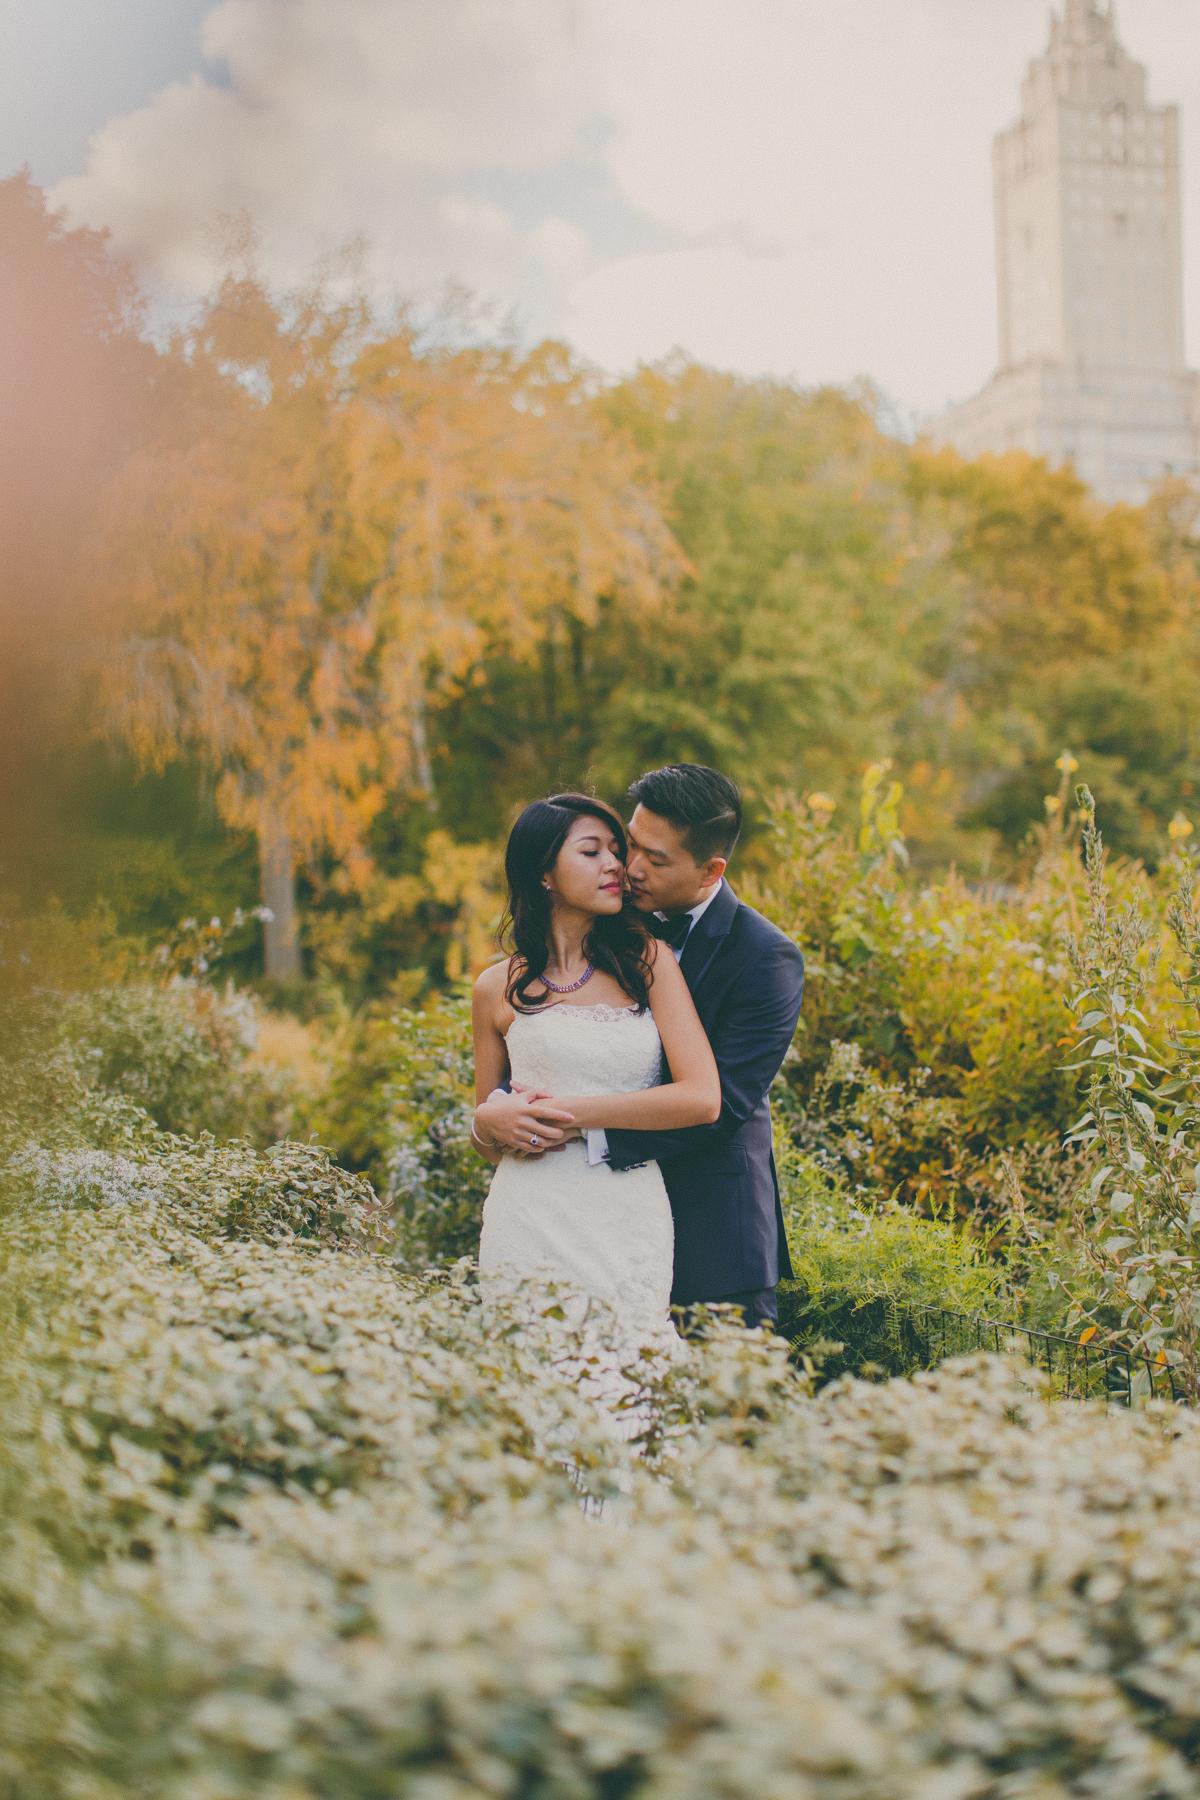 Brooklyn wedding photographer, vintage wedding photo